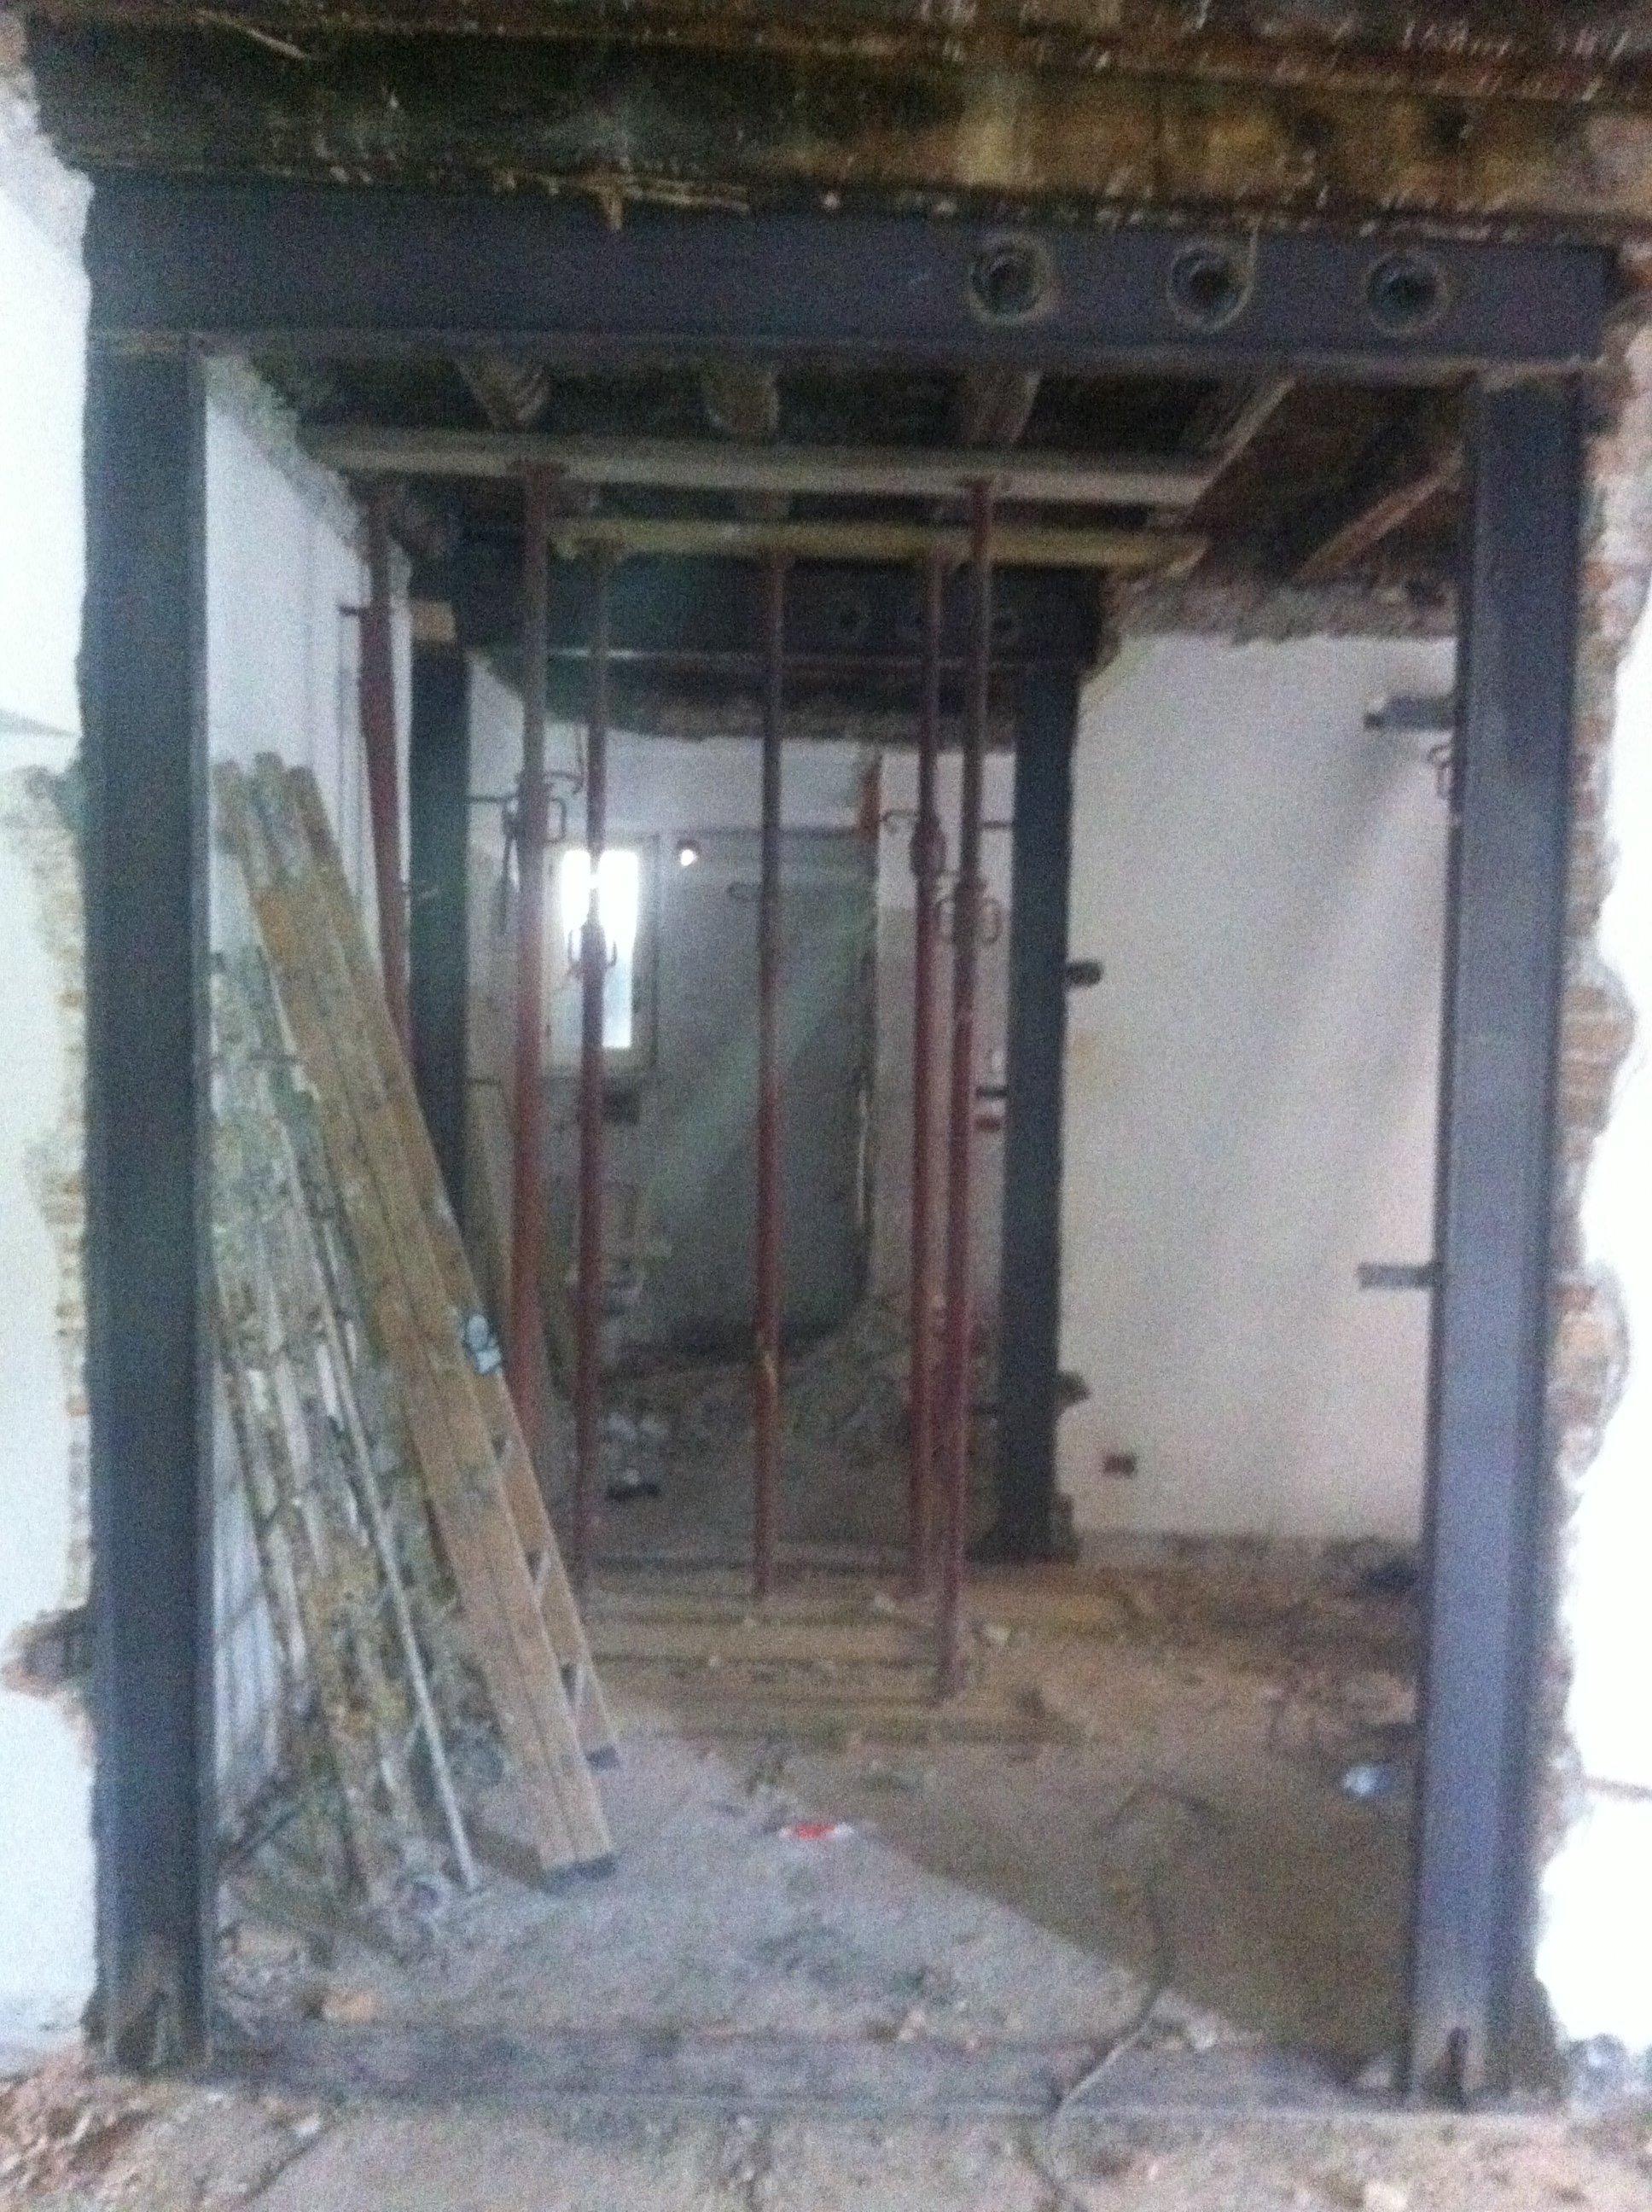 Interno di una stanza in ristrutturazione